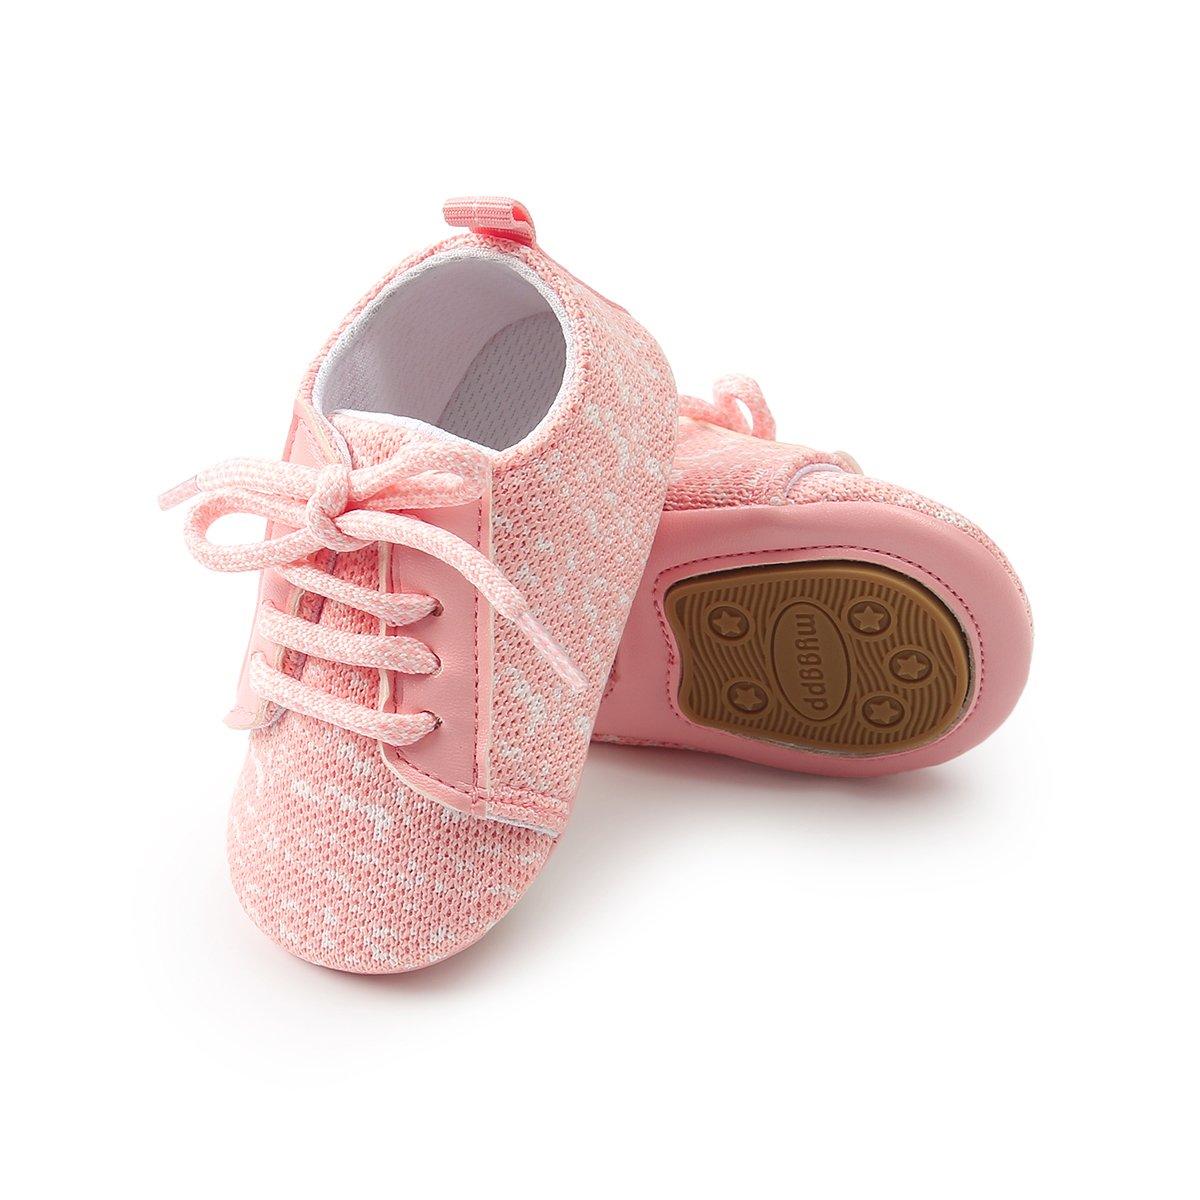 Meckior ユニセックスベビー B07B656N2W 0-6 months A-pink A-pink 0-6 months